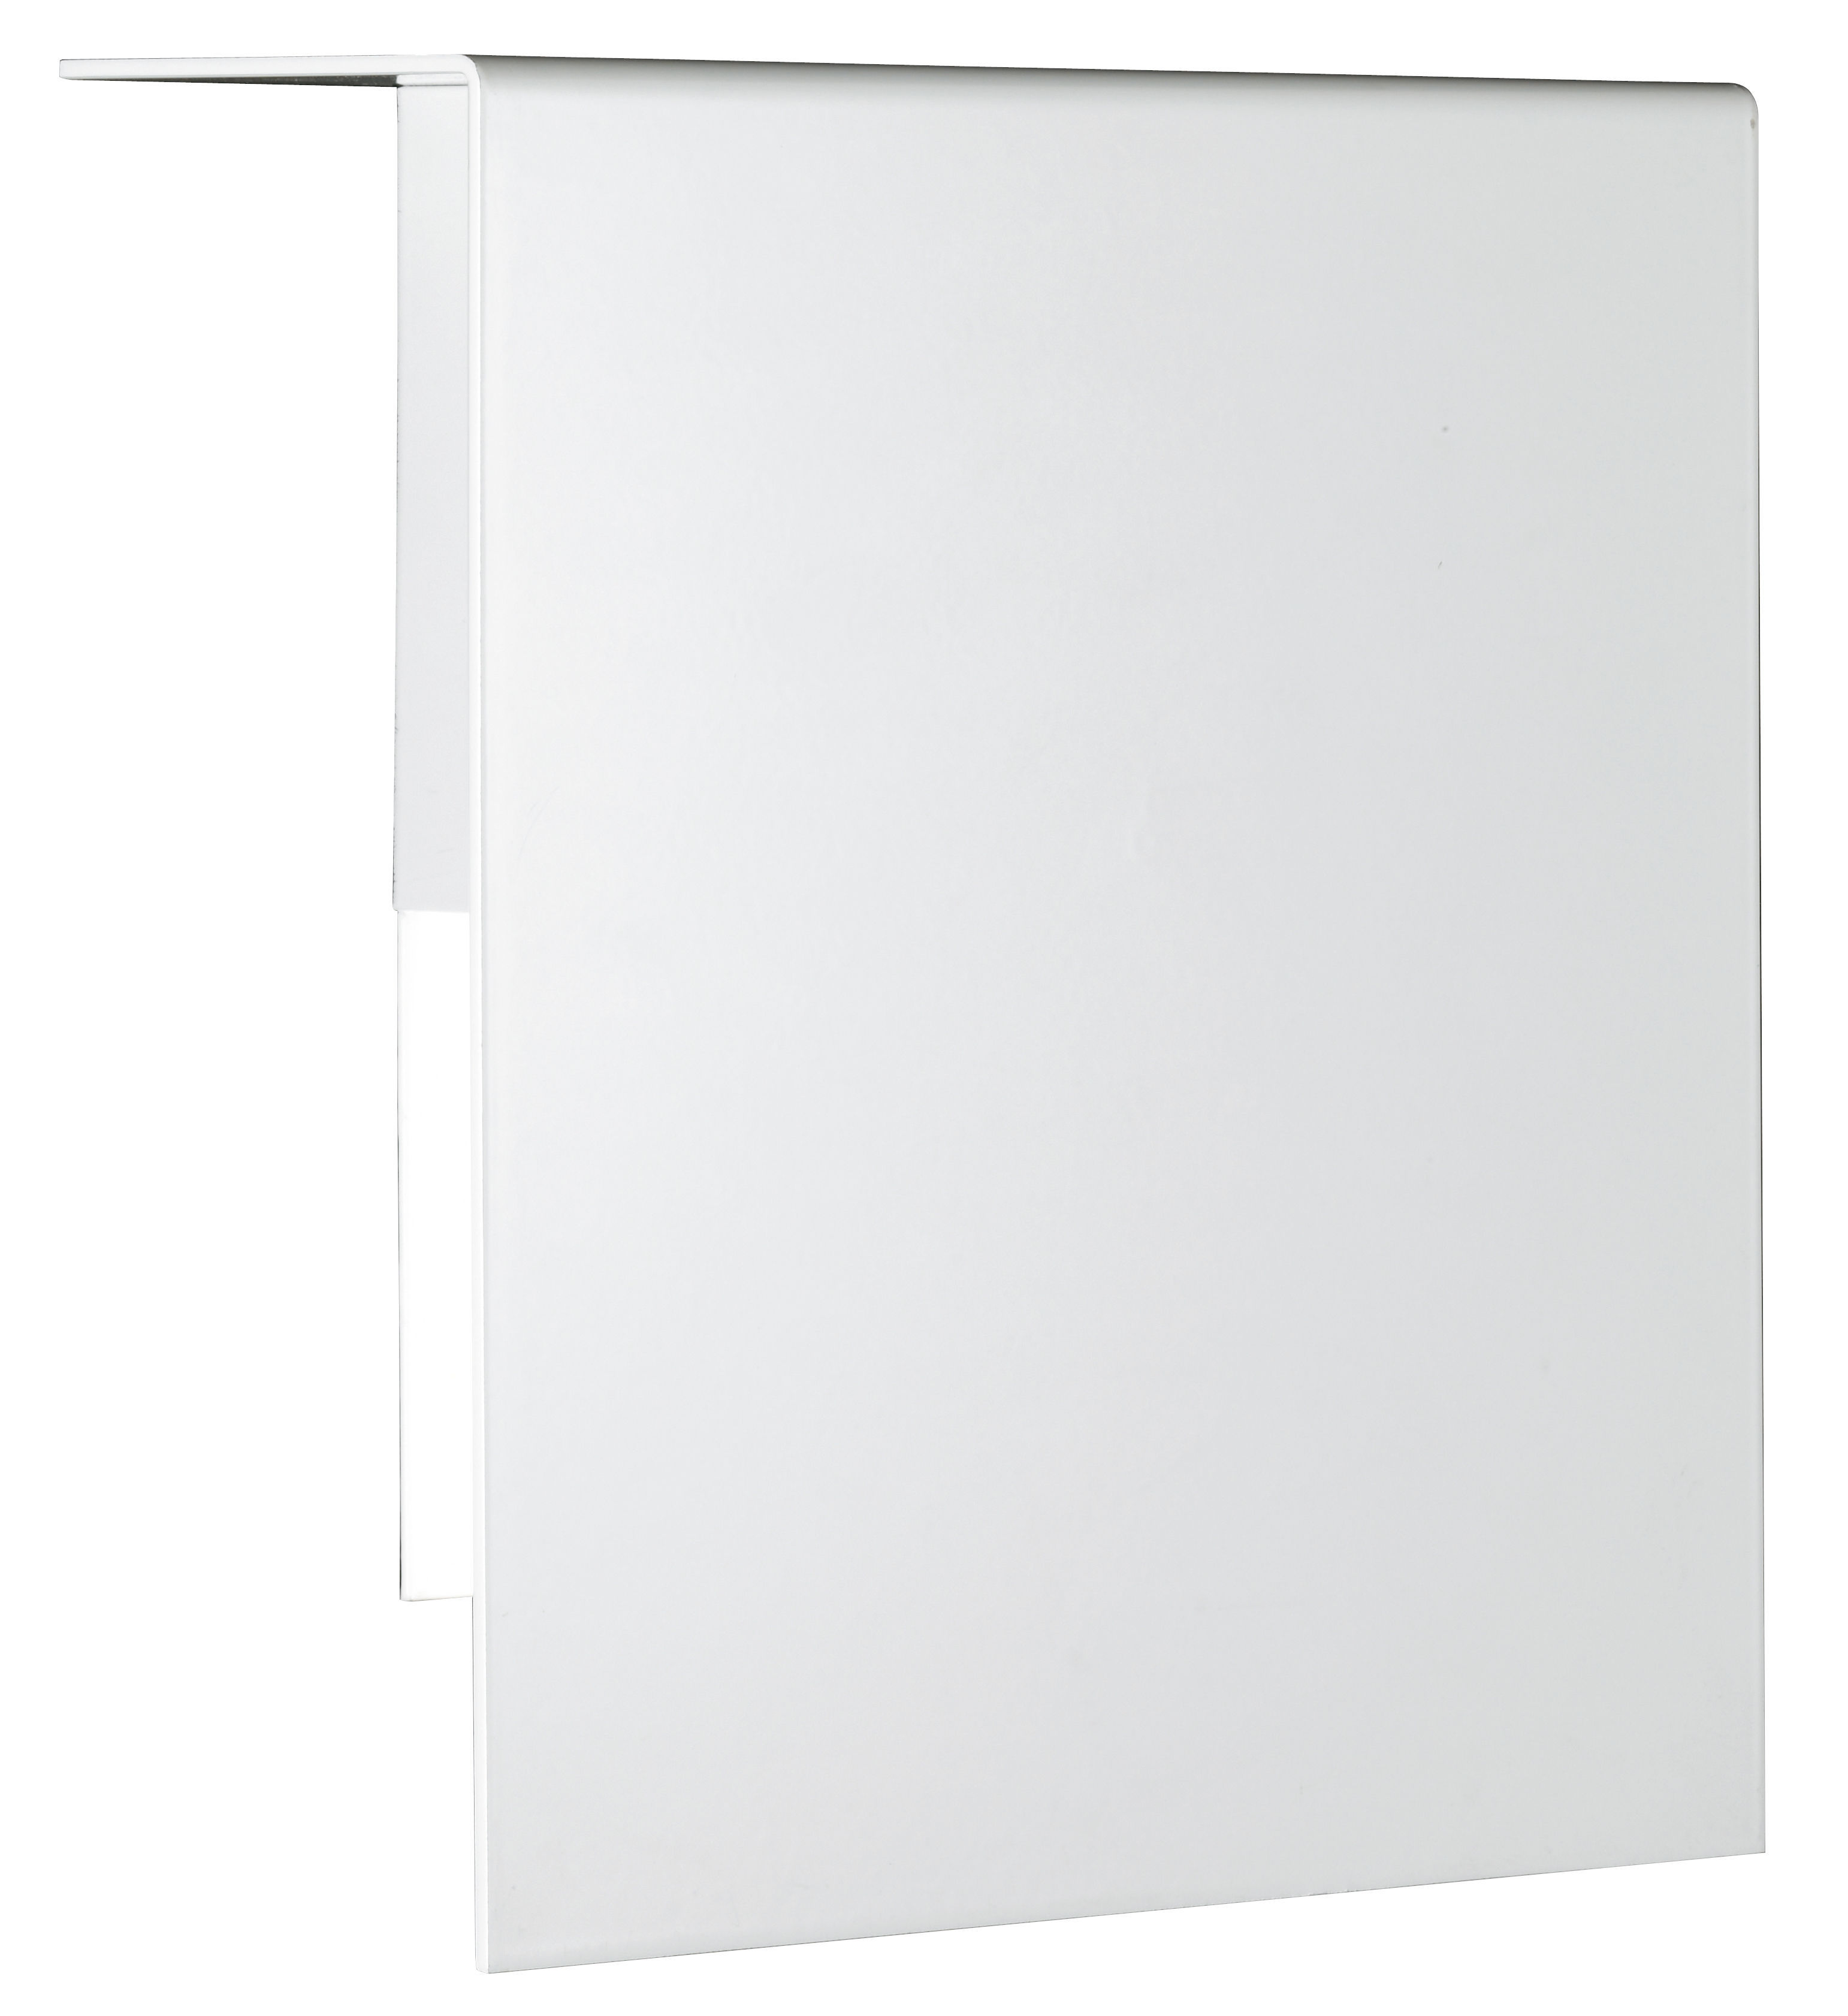 Lighting - Wall Lights - Corrubedo LED Wall light by Fontana Arte - White - Lacquered metal, Satin glass